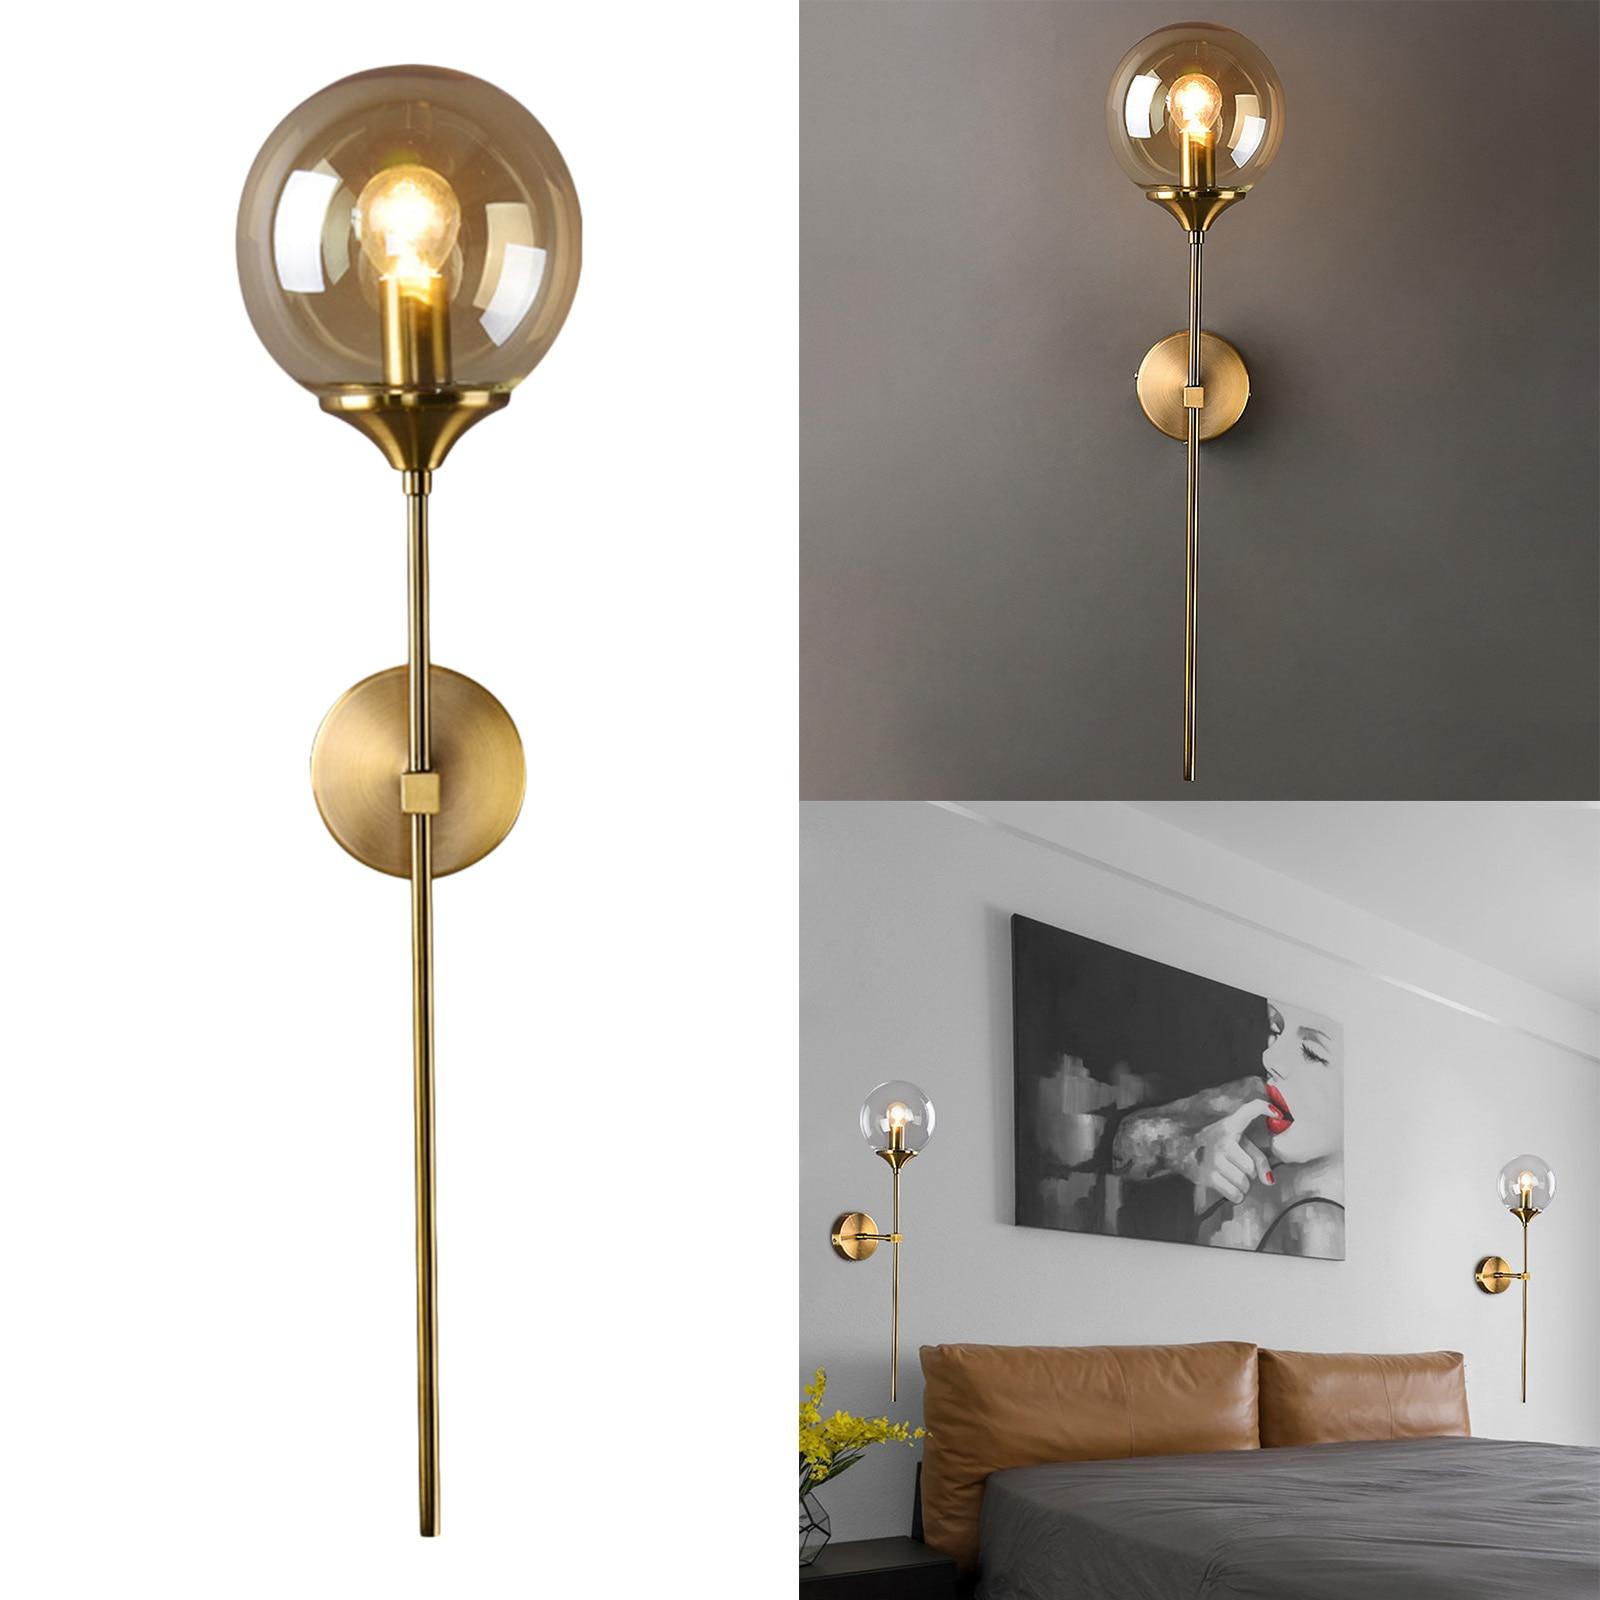 Industrial Gold Wall Sconce Lighting Modern Indoor Bedroom Wall Lights Indoor Wall Lanterns for Living Room Hallway Wall Light